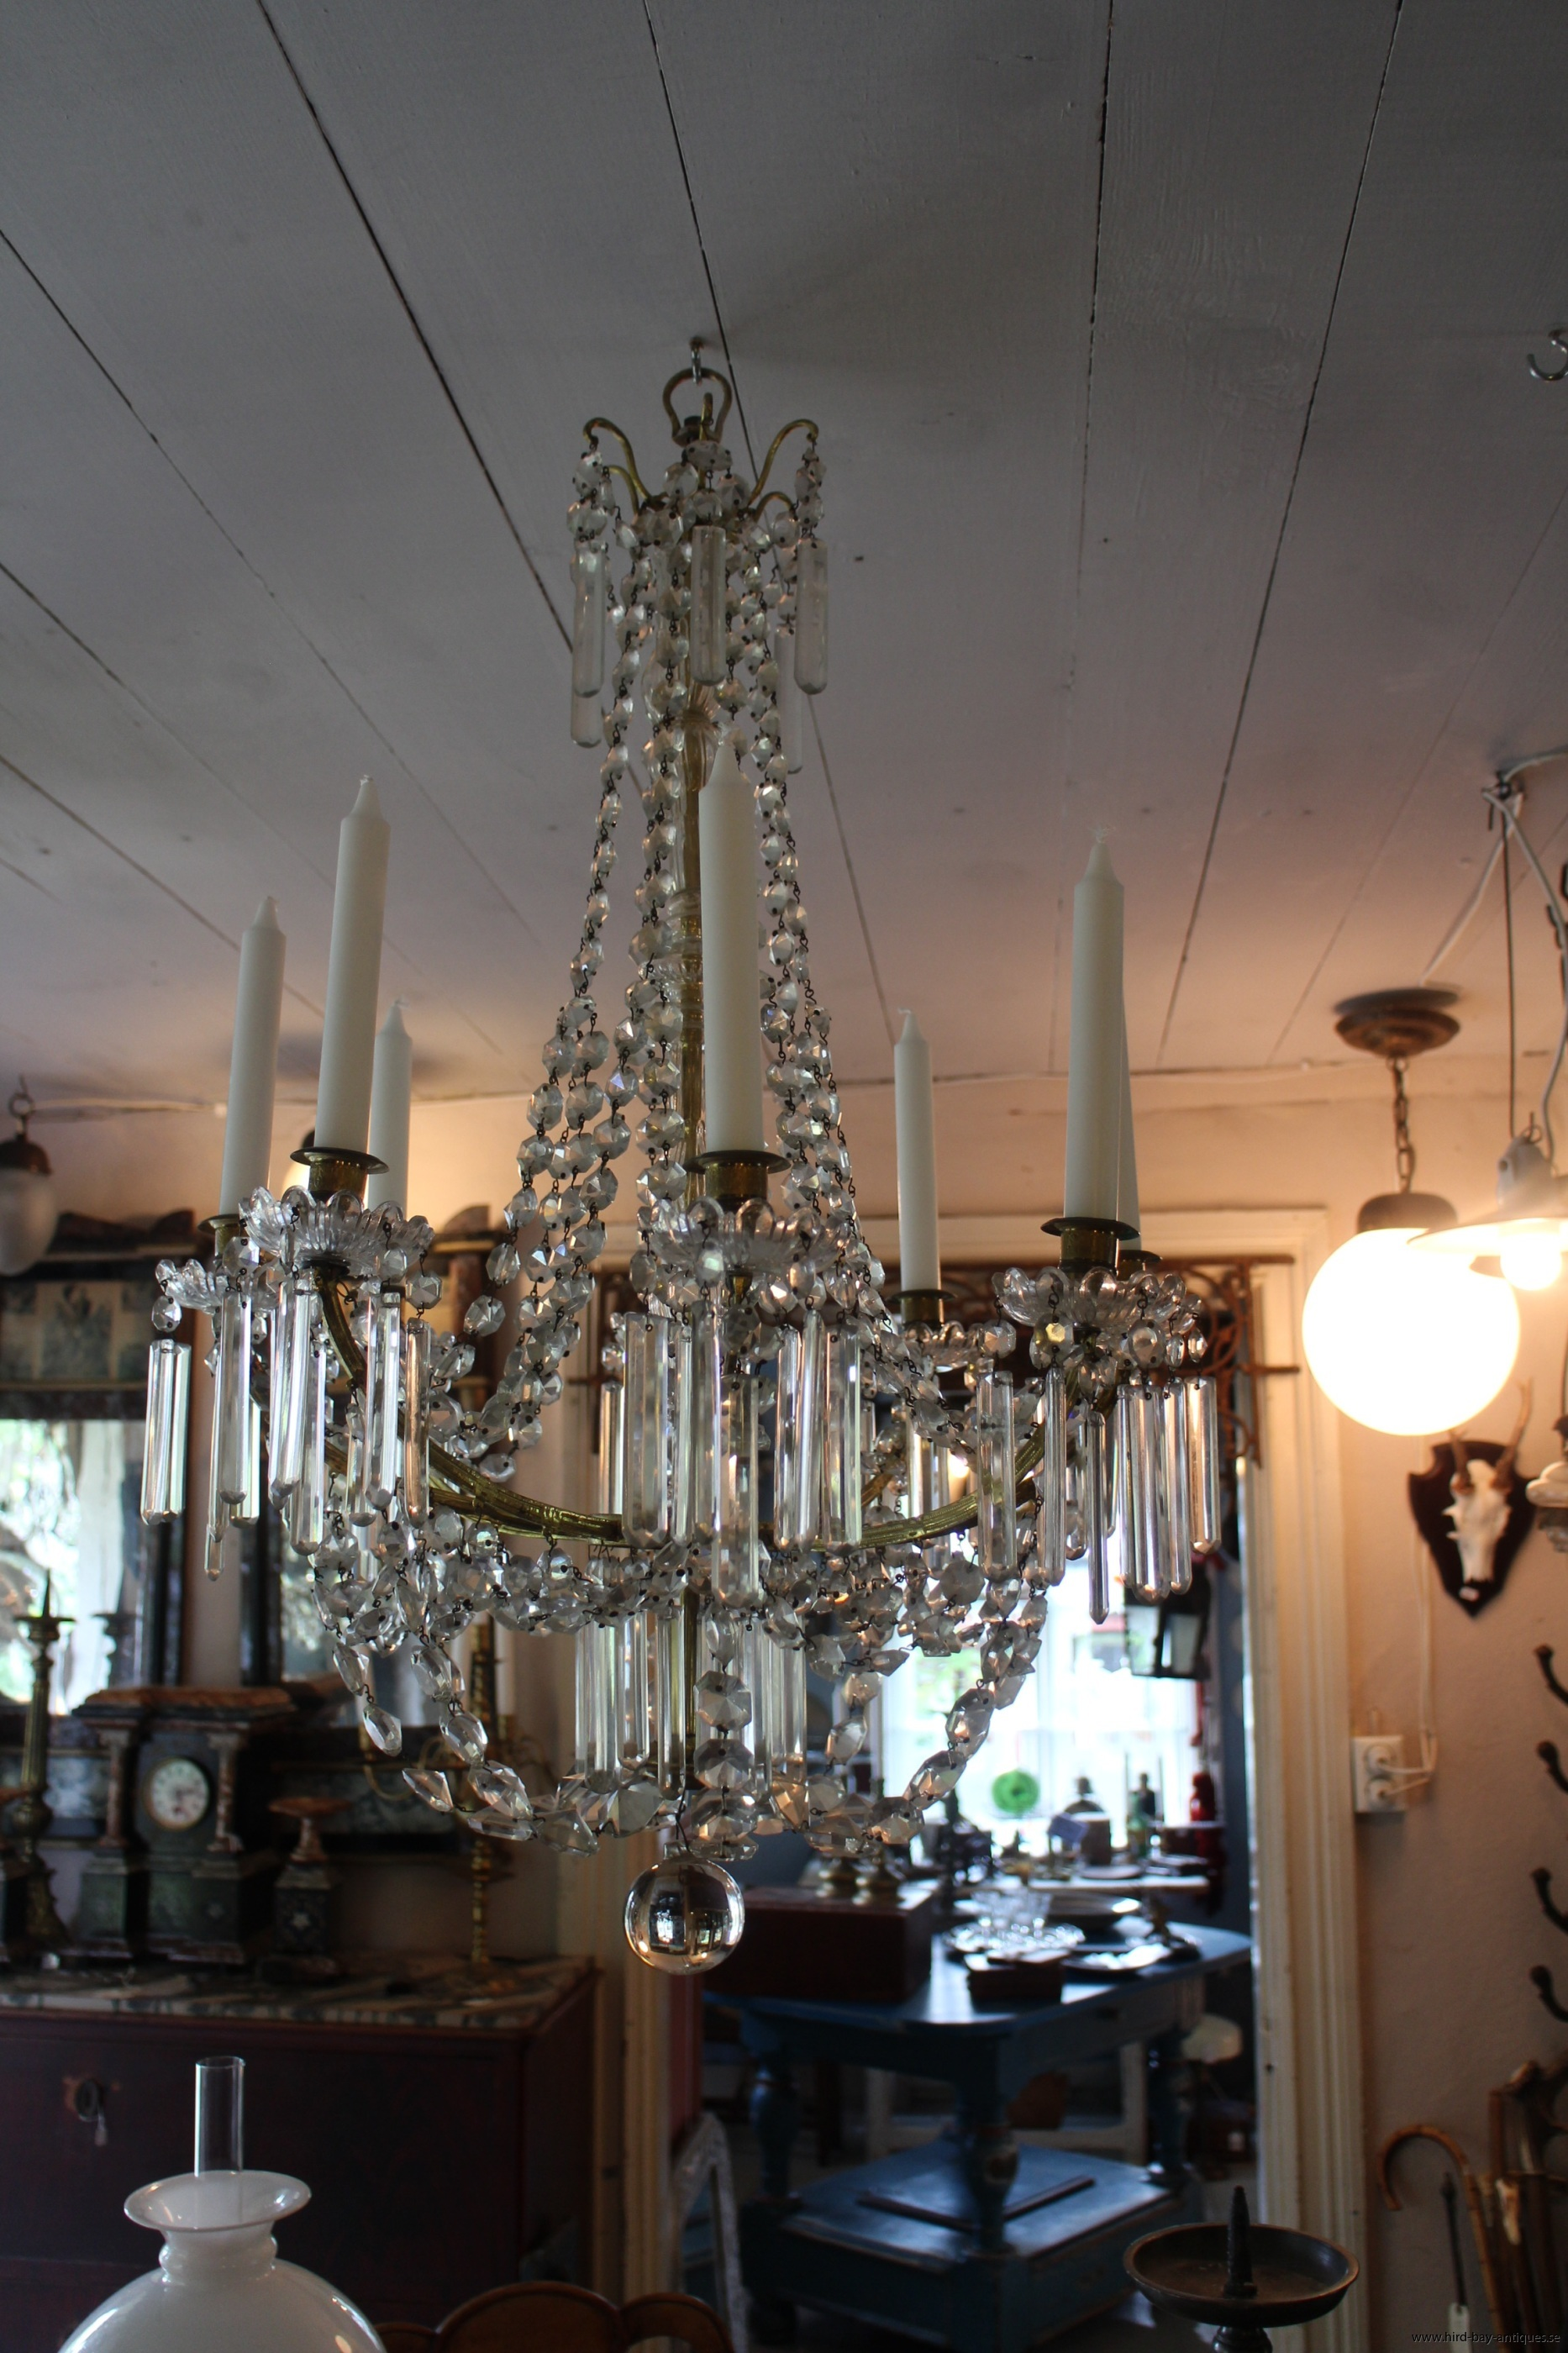 kristall ljuskrona oscariansk antik